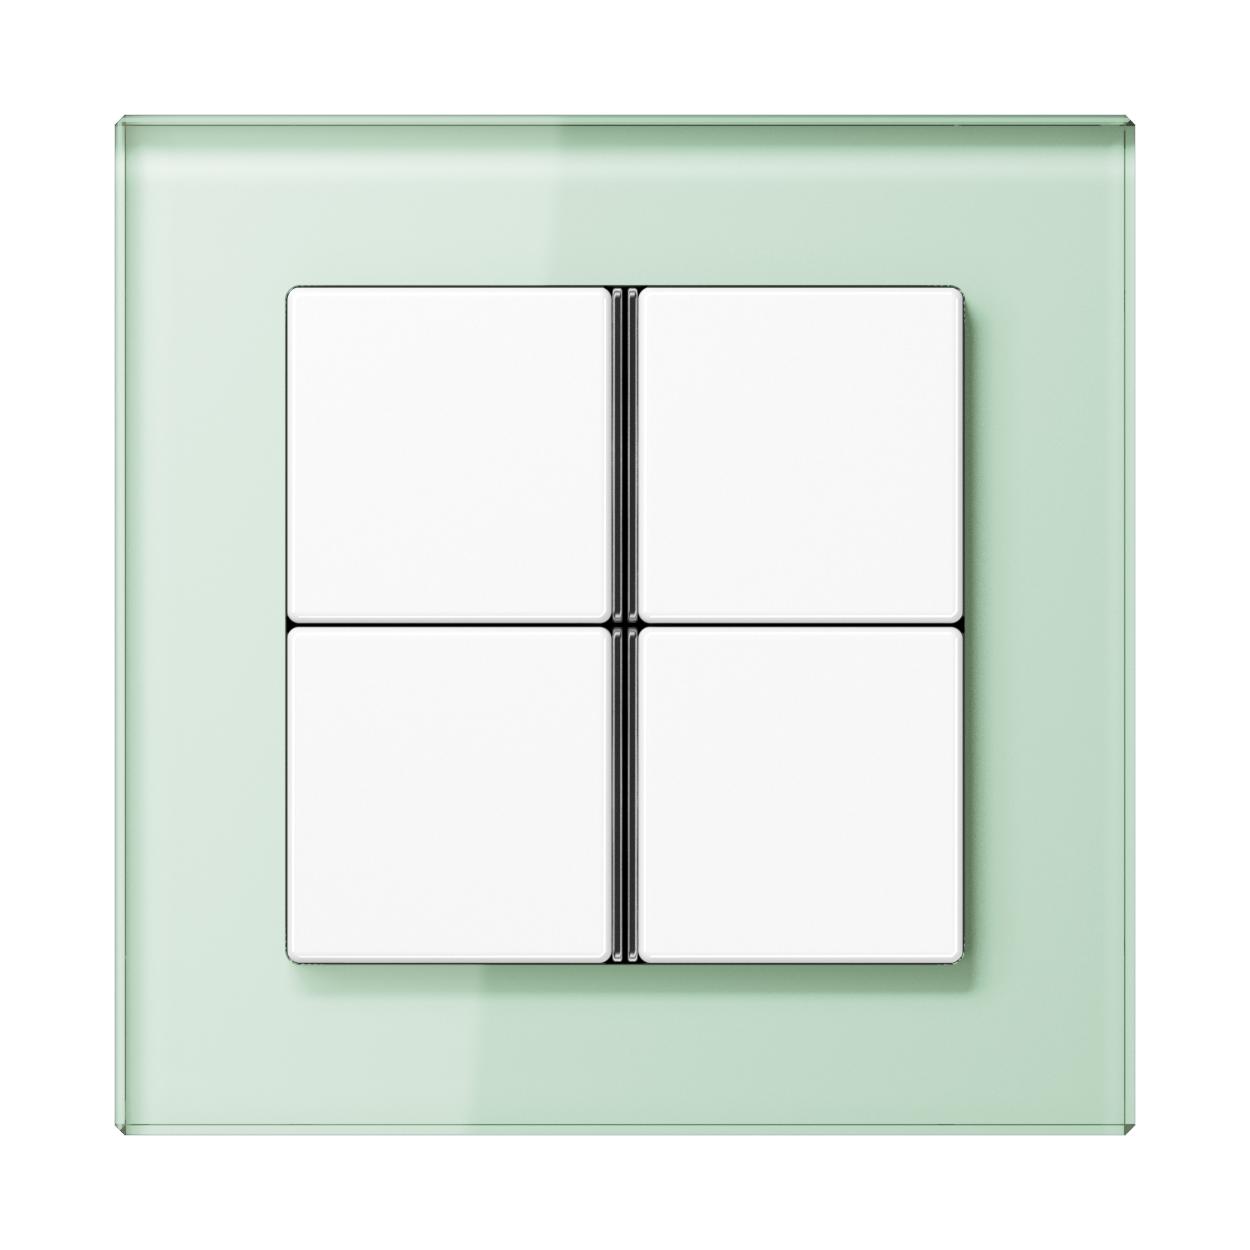 JUNG_AC_GL_soft-white_4button